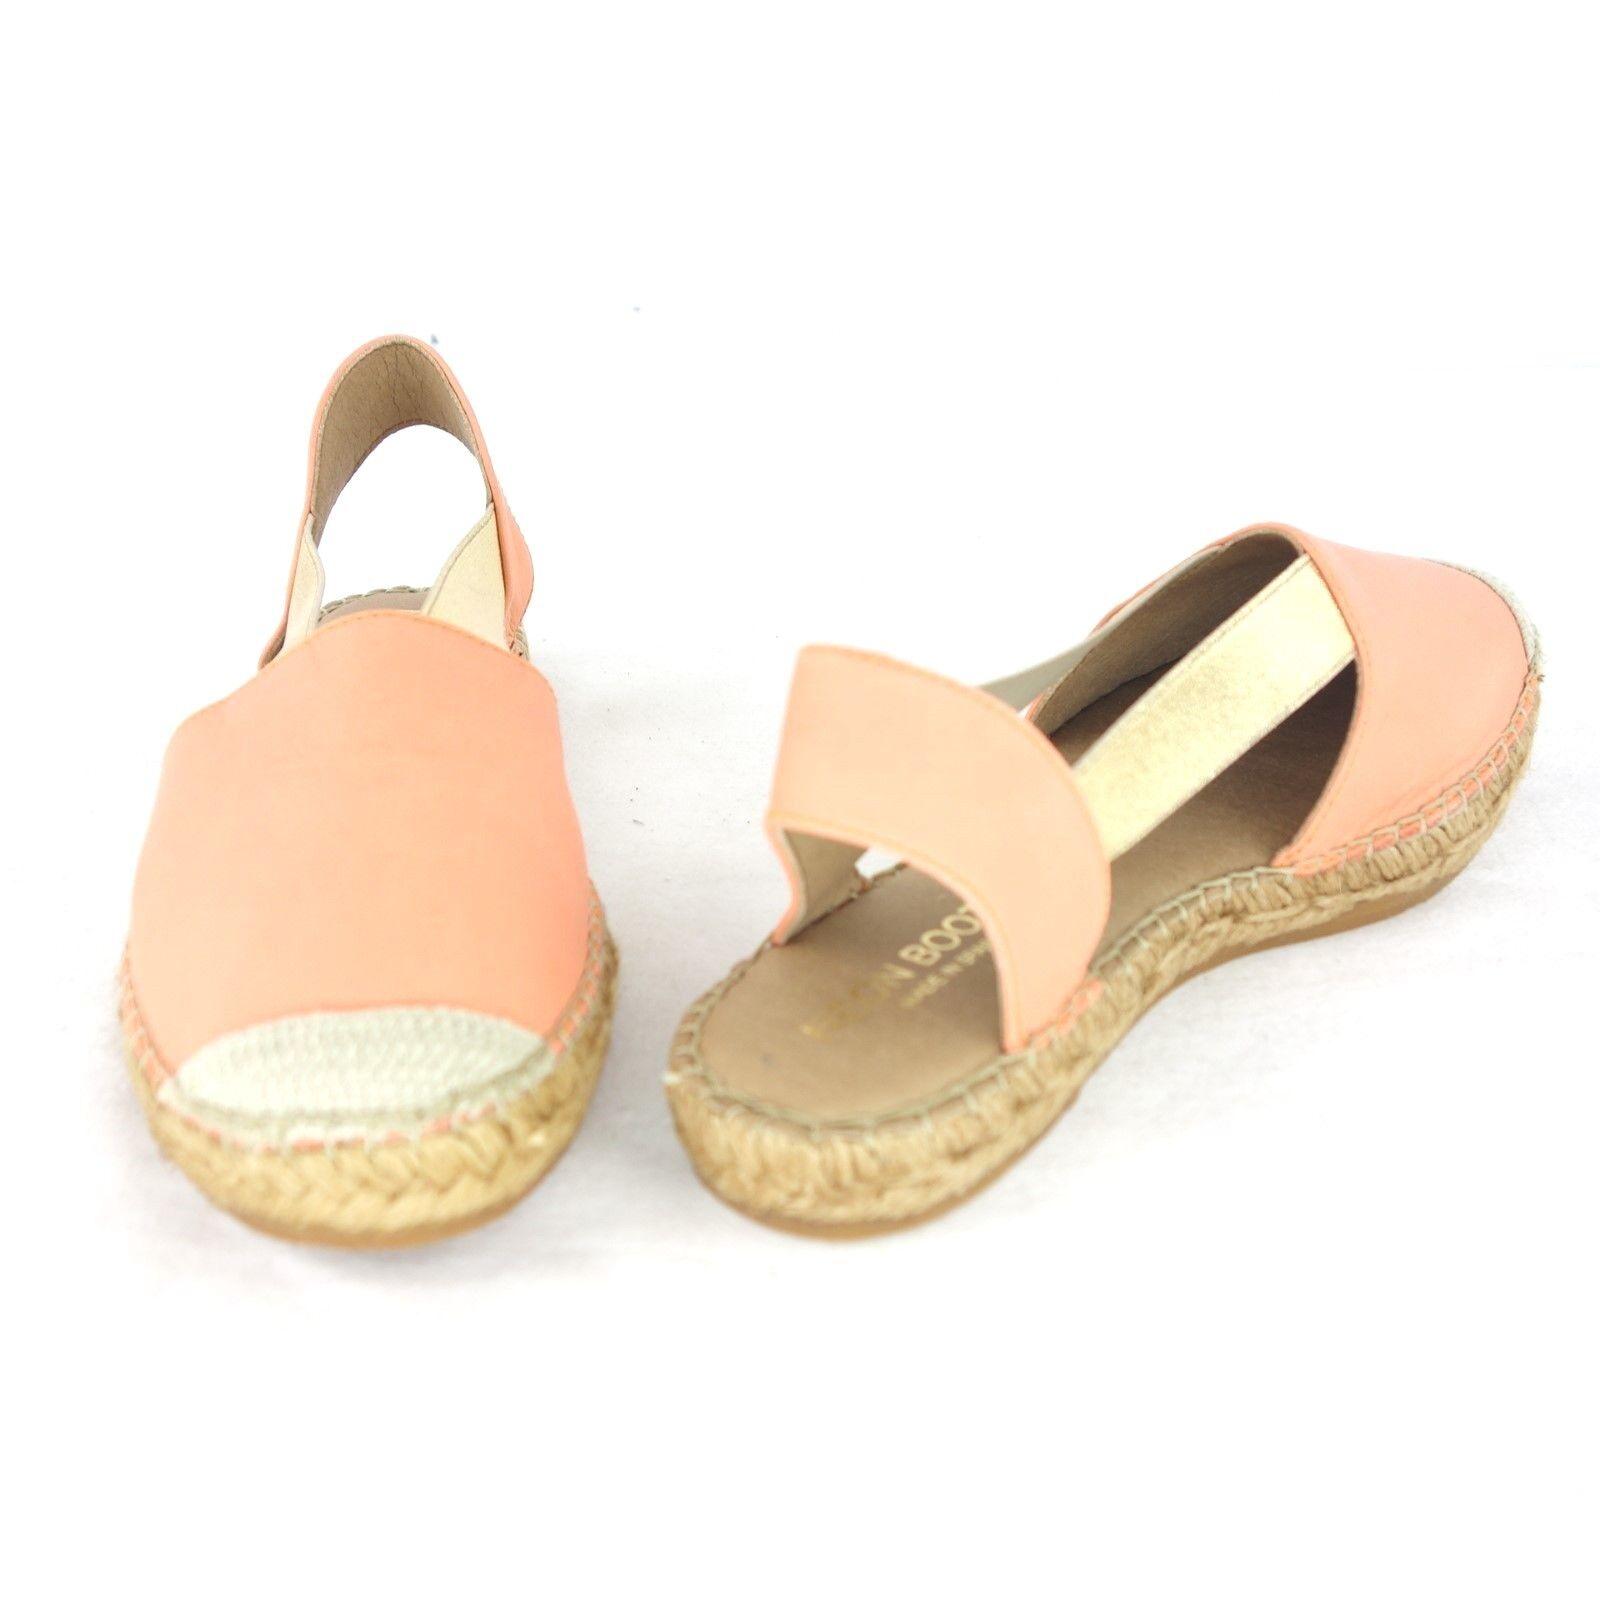 NEON Stiefel Damen Sandalen 36 Espadrilles Pantoletten Schuhe EU 36 Sandalen Leder NP 109 NEU ef740d